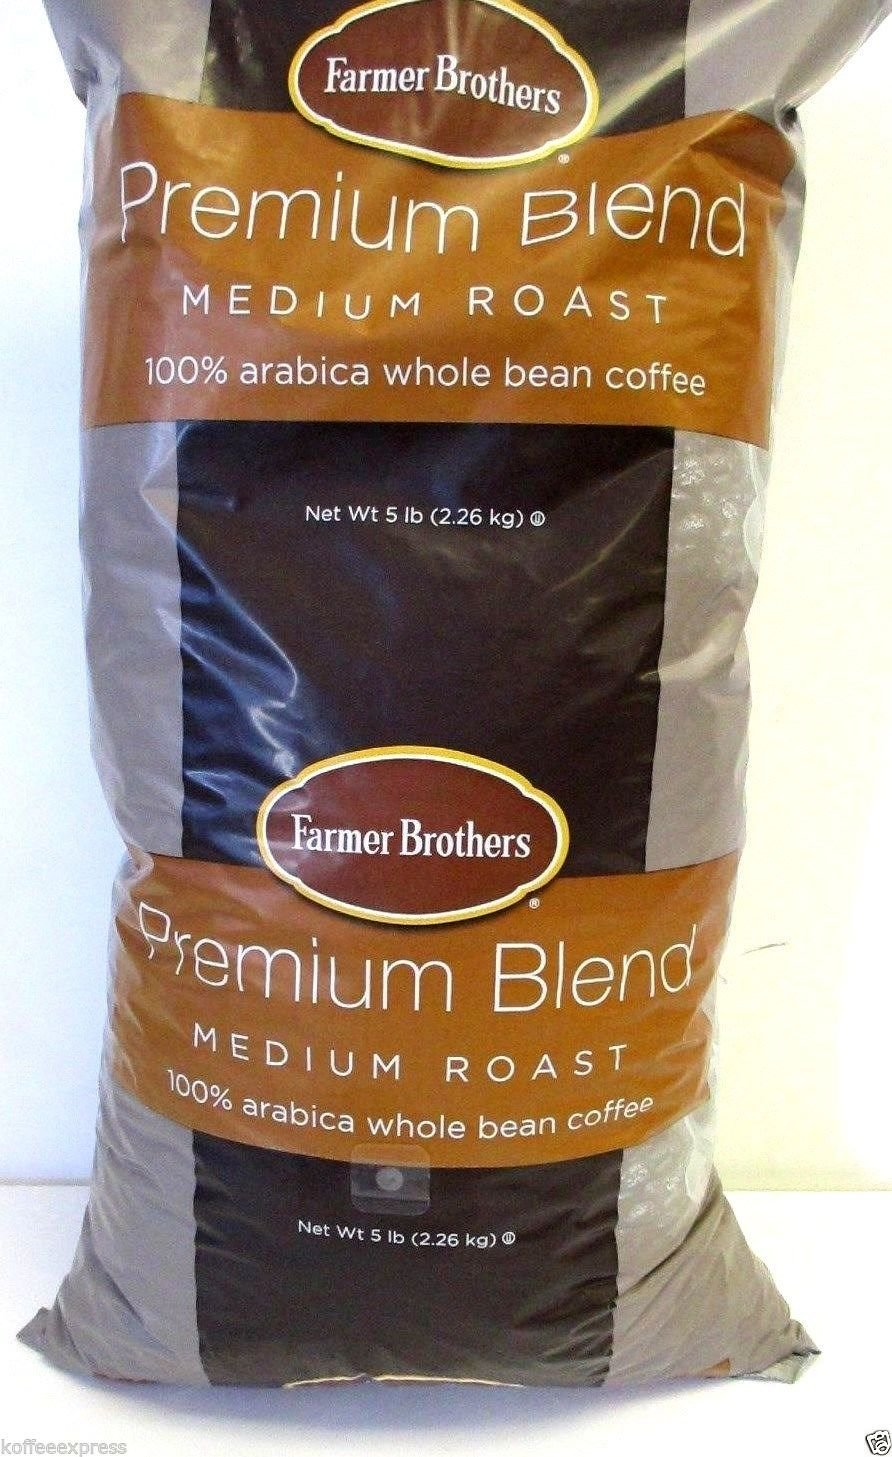 Farmer Brothers Premium Blend 100% Arabica Whole Bean Coffee (1 bag/5 lbs) by Farmer Brothers